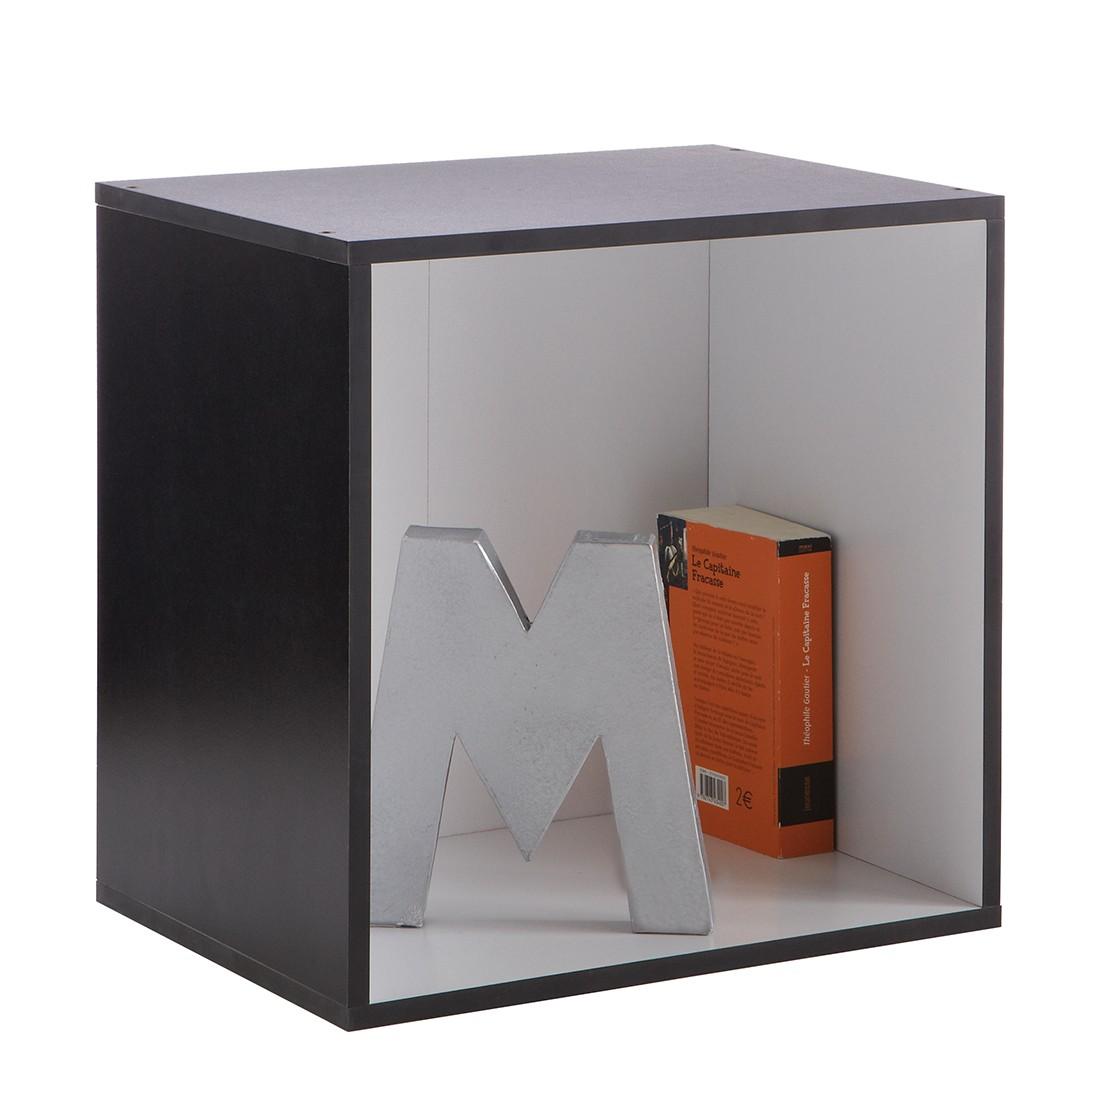 regalw rfel weiss. Black Bedroom Furniture Sets. Home Design Ideas